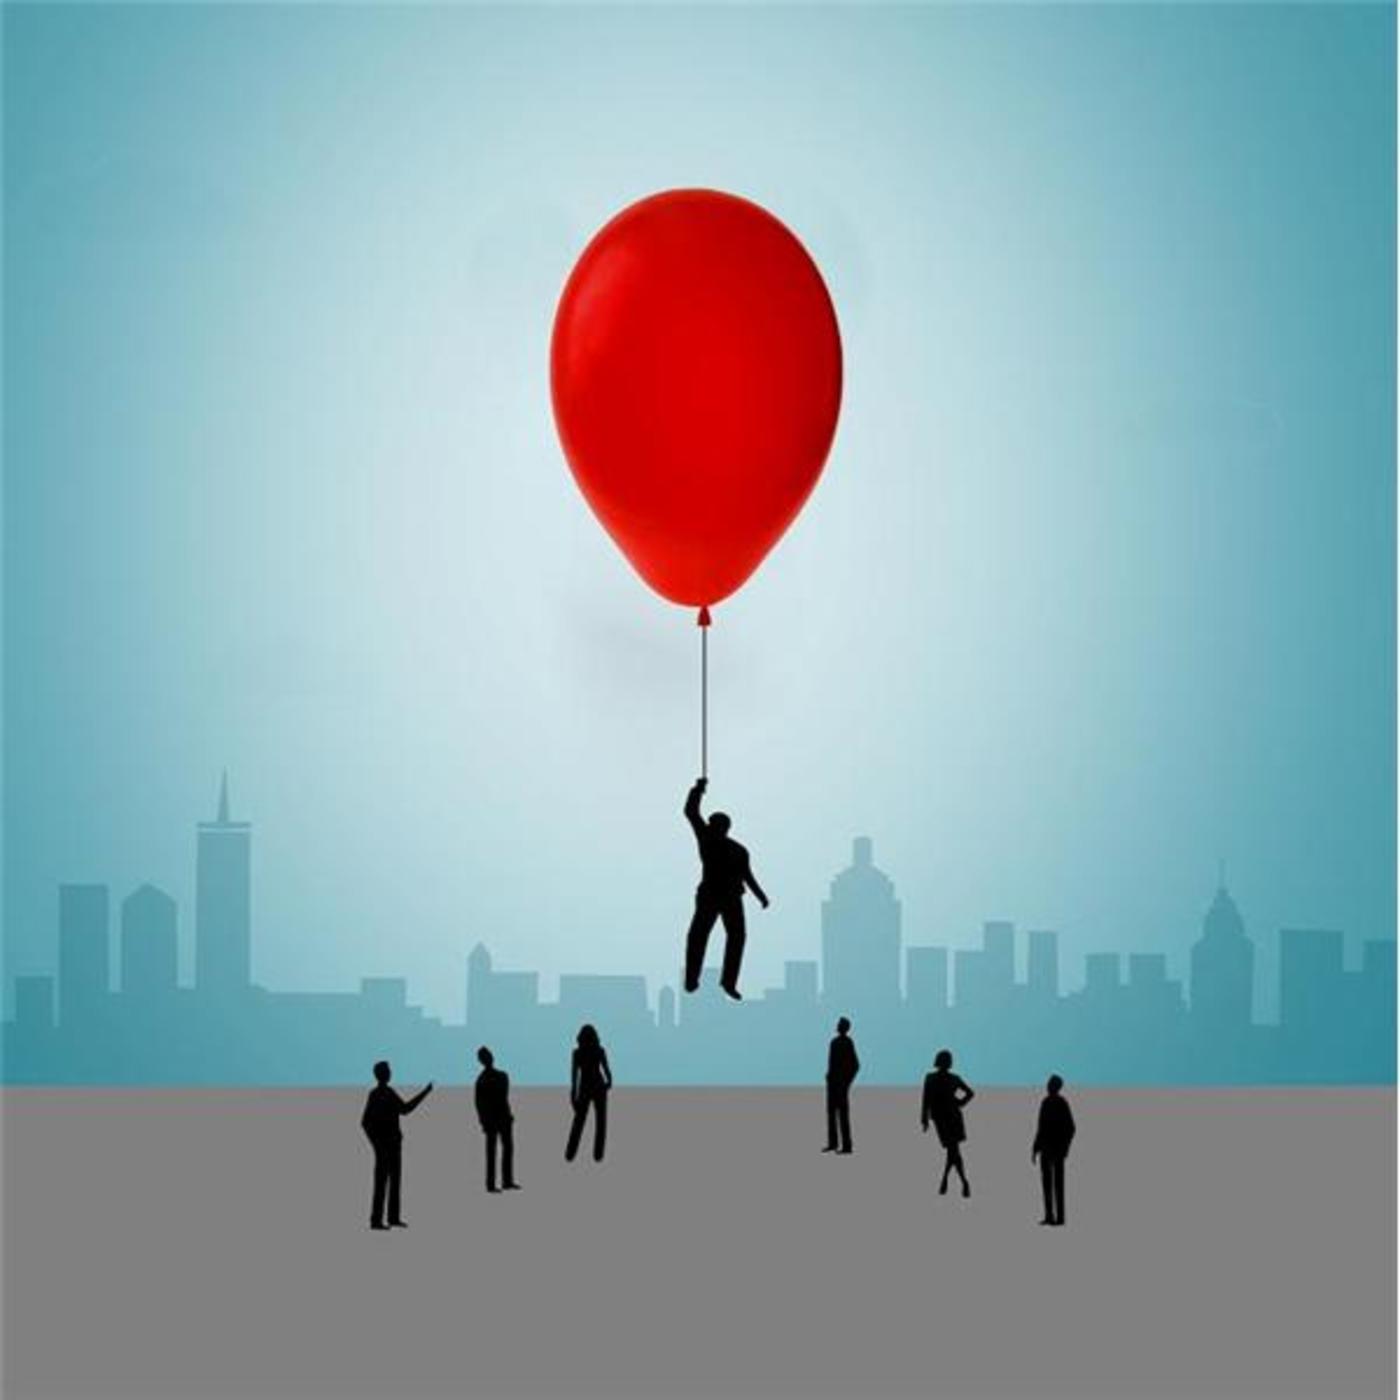 Executives–Be Careful With Those Metrics!